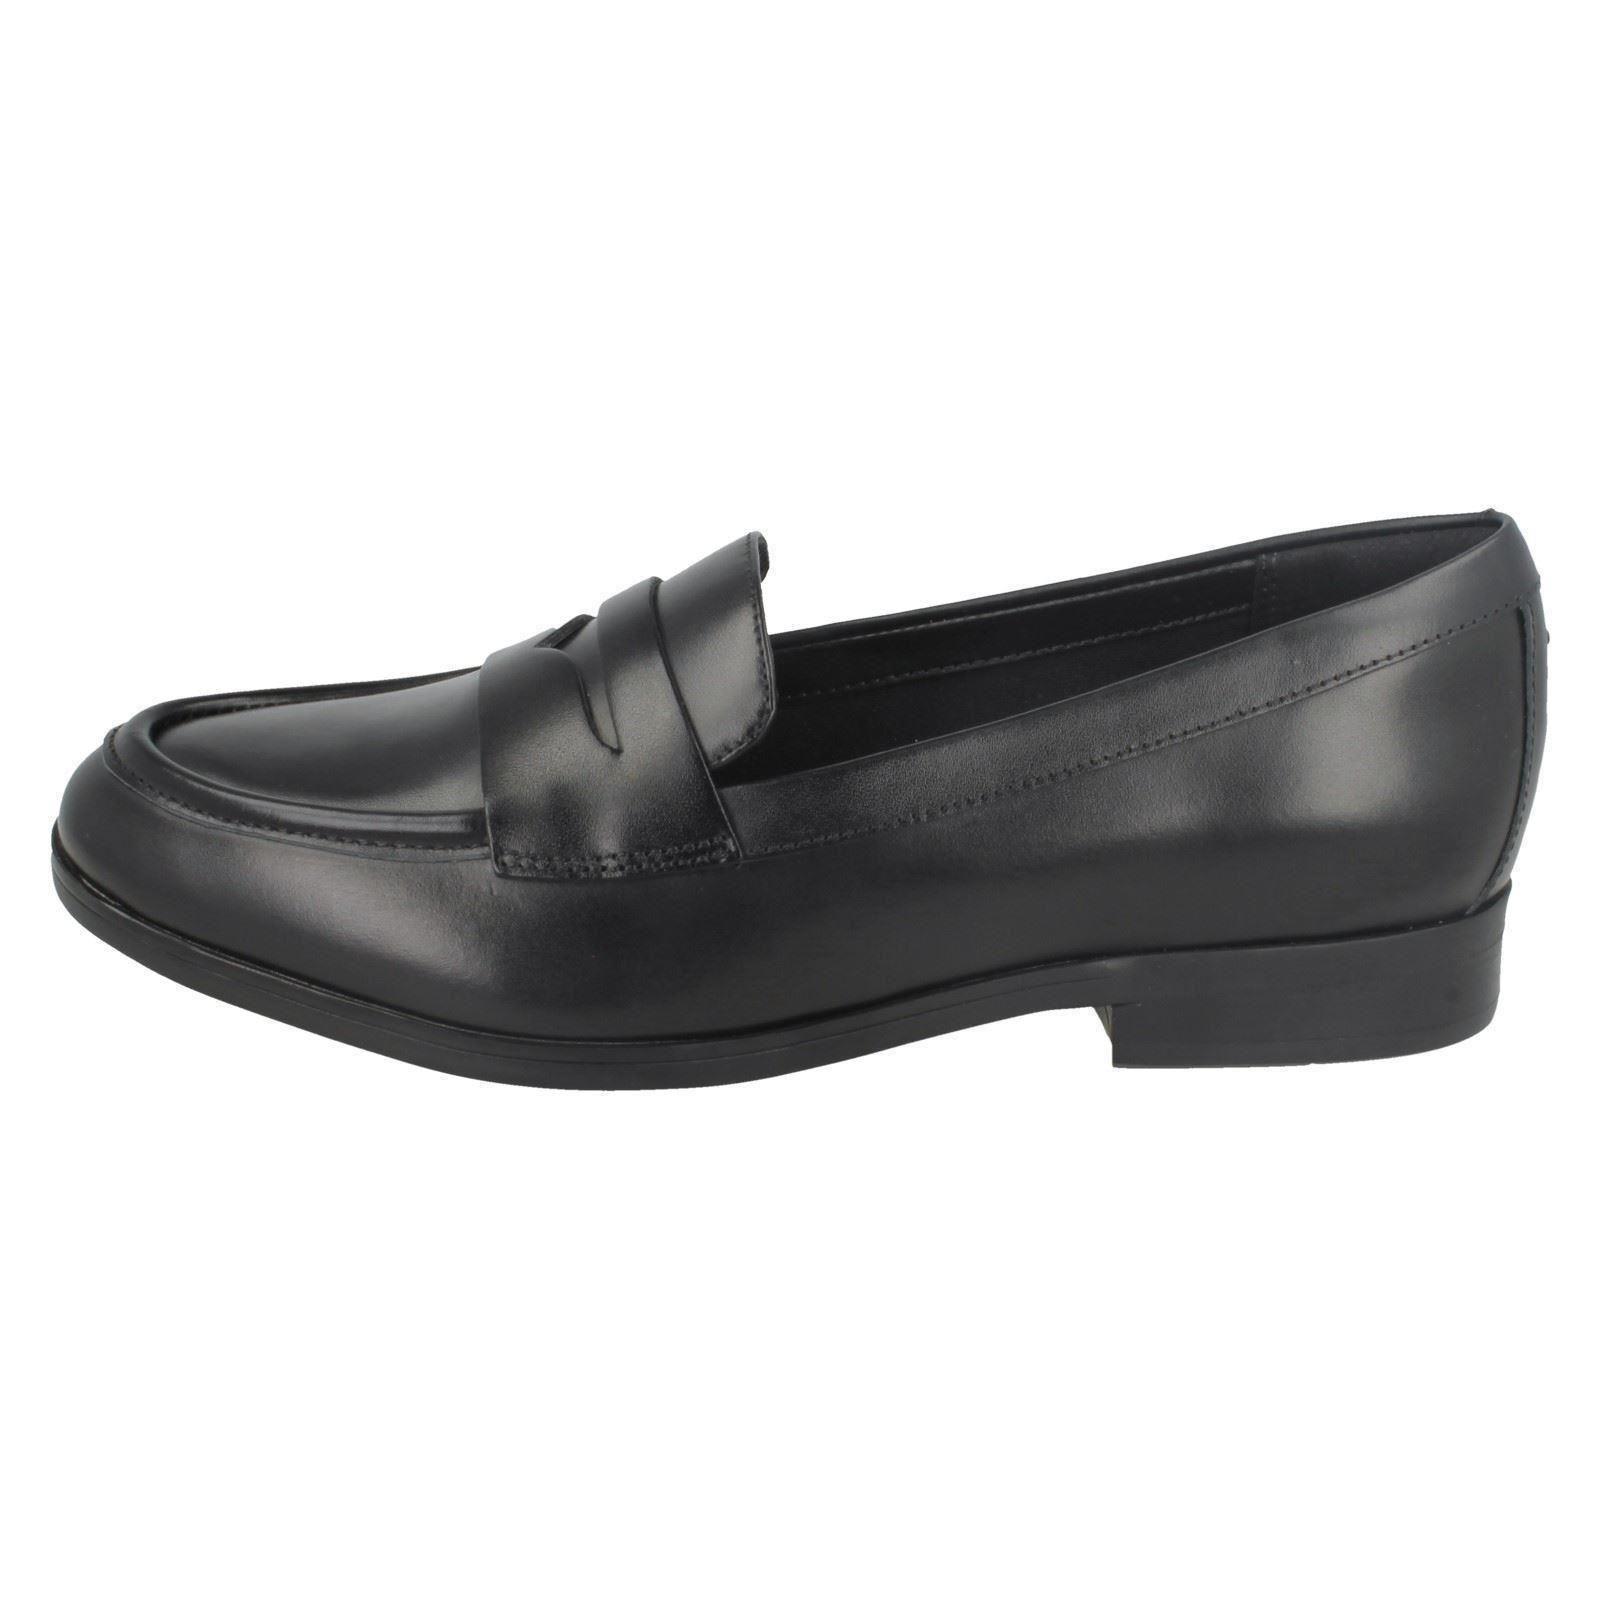 Tilmont Clarks Style Black Flats Zoe Loafer Ladies w0aqI0S